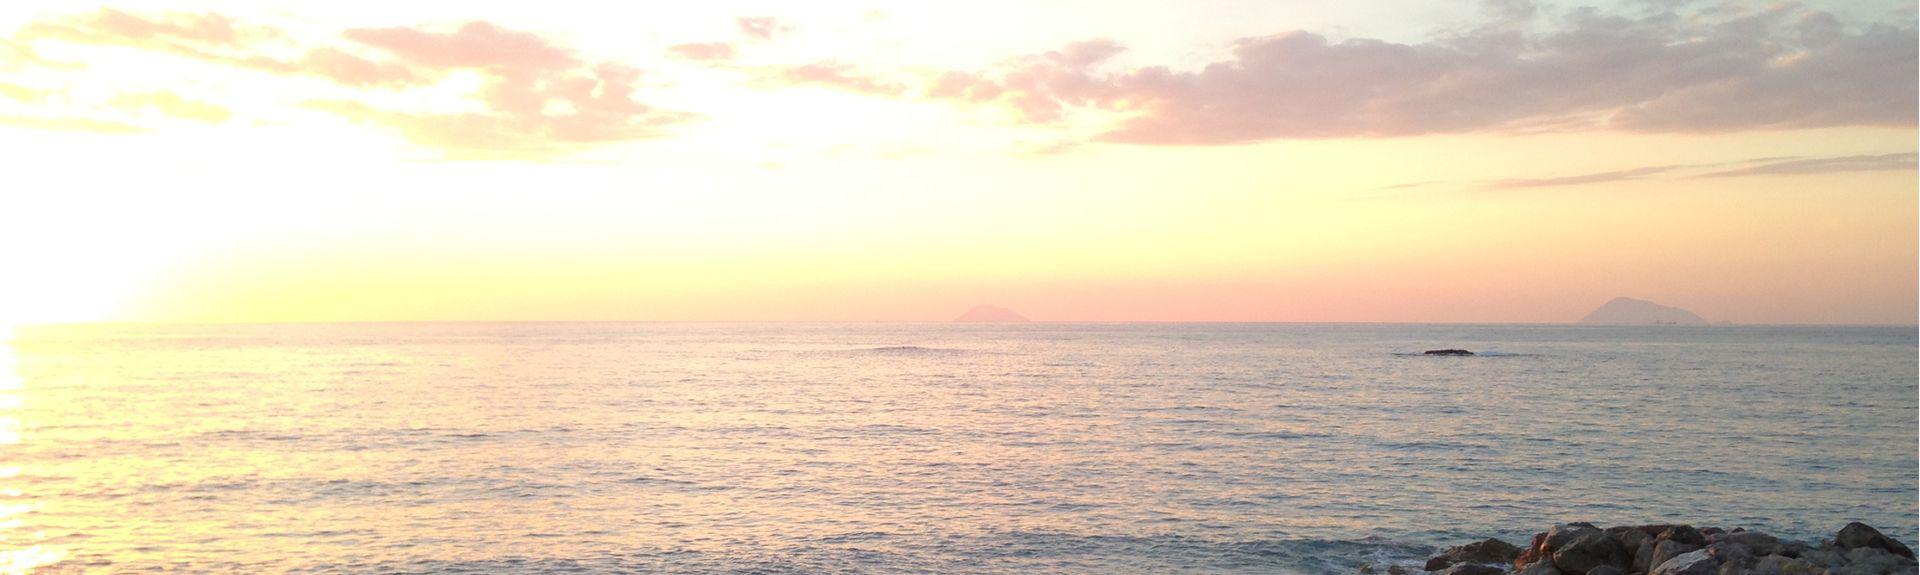 Messinan maakunta, Sisilia, Italia